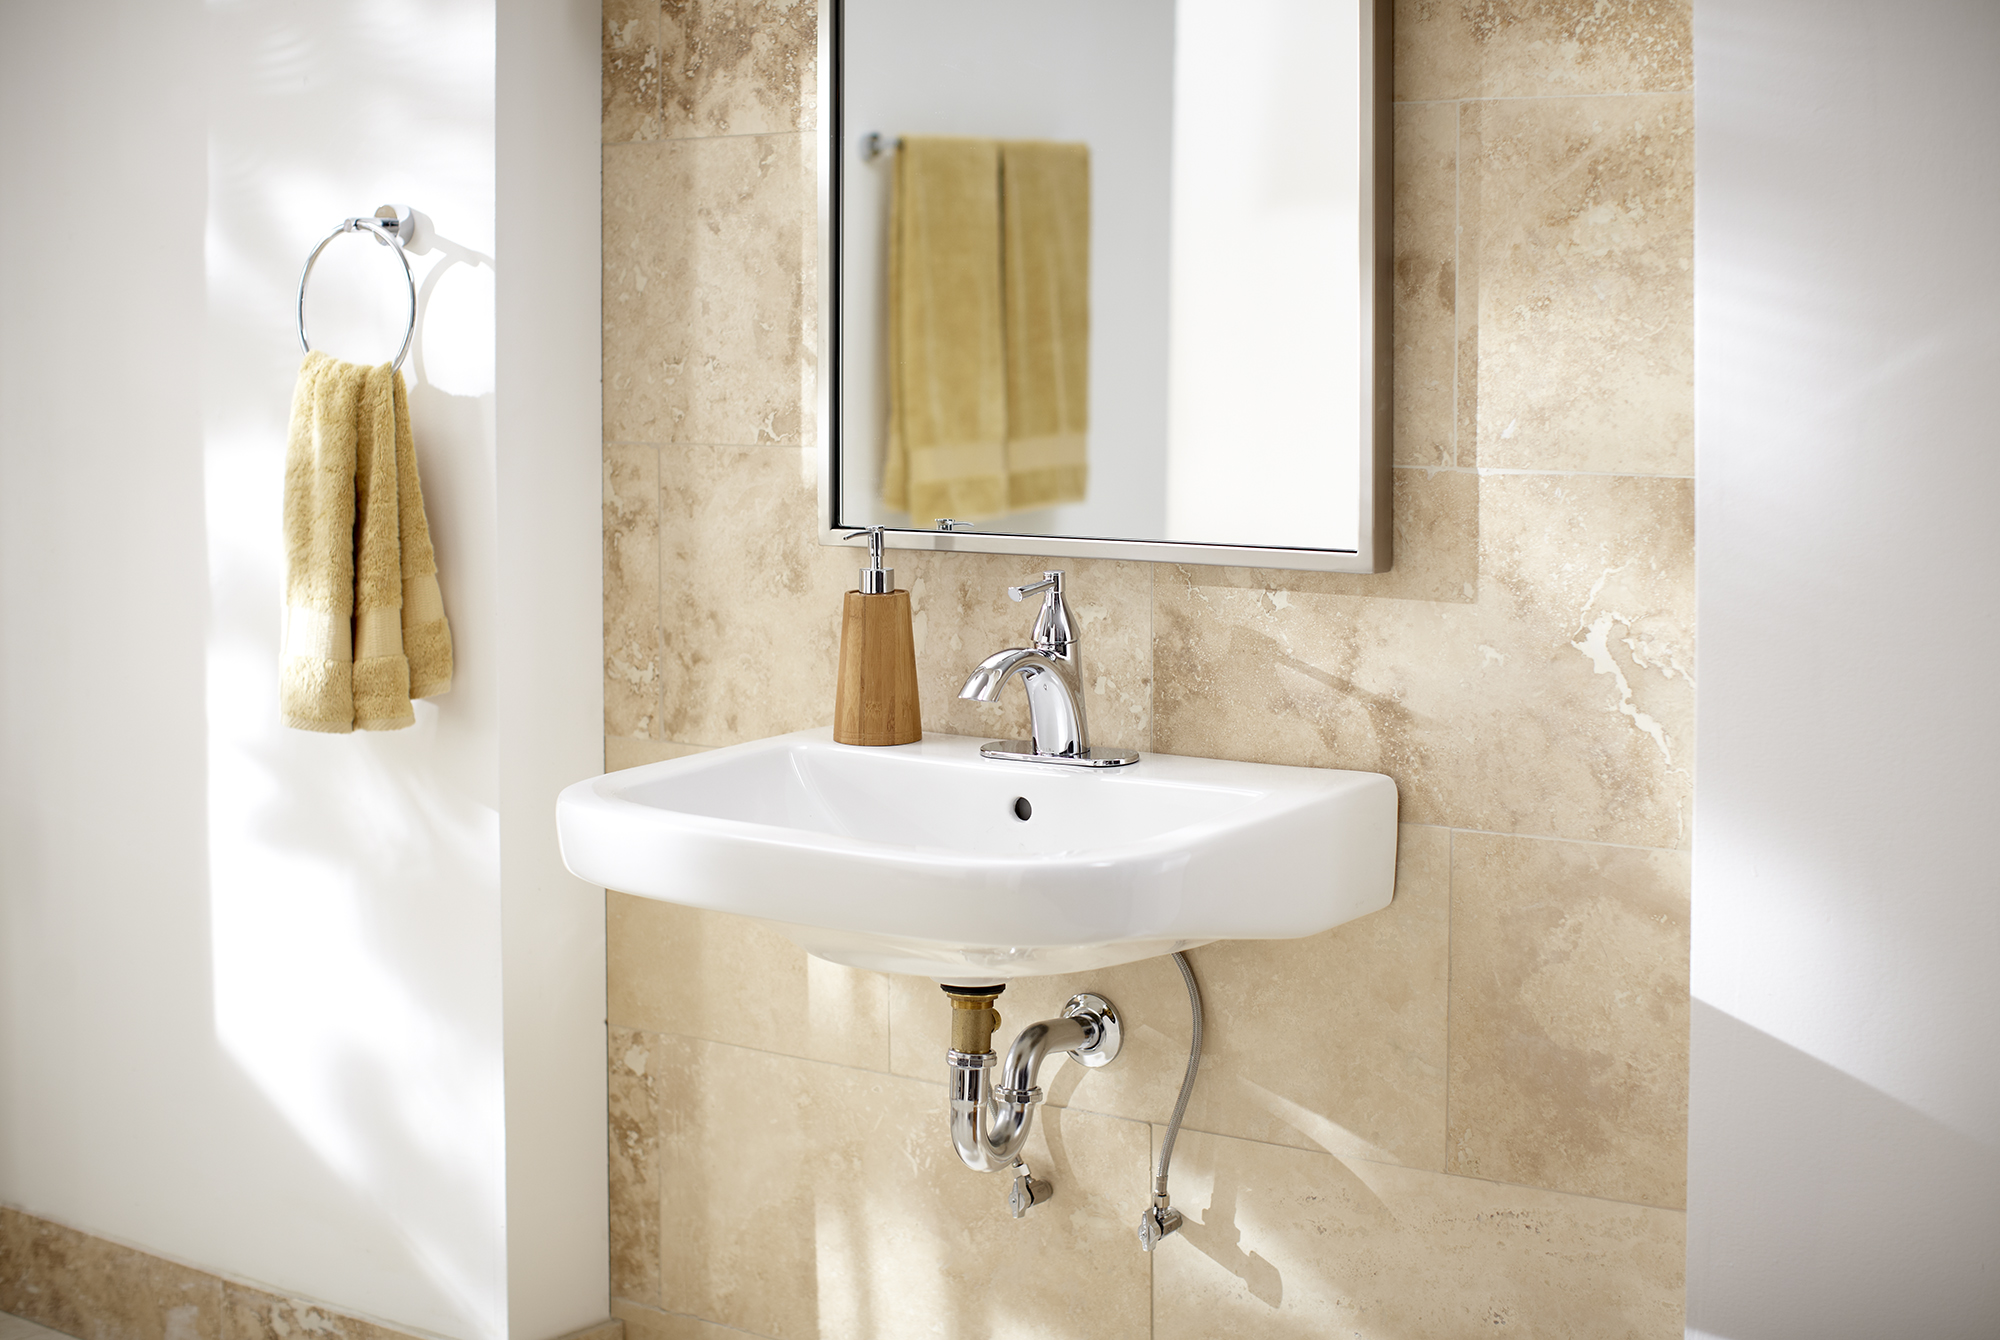 DISCONTINUED Riverdale?? Single Handle Bathroom Faucet | Gerber Plumbing